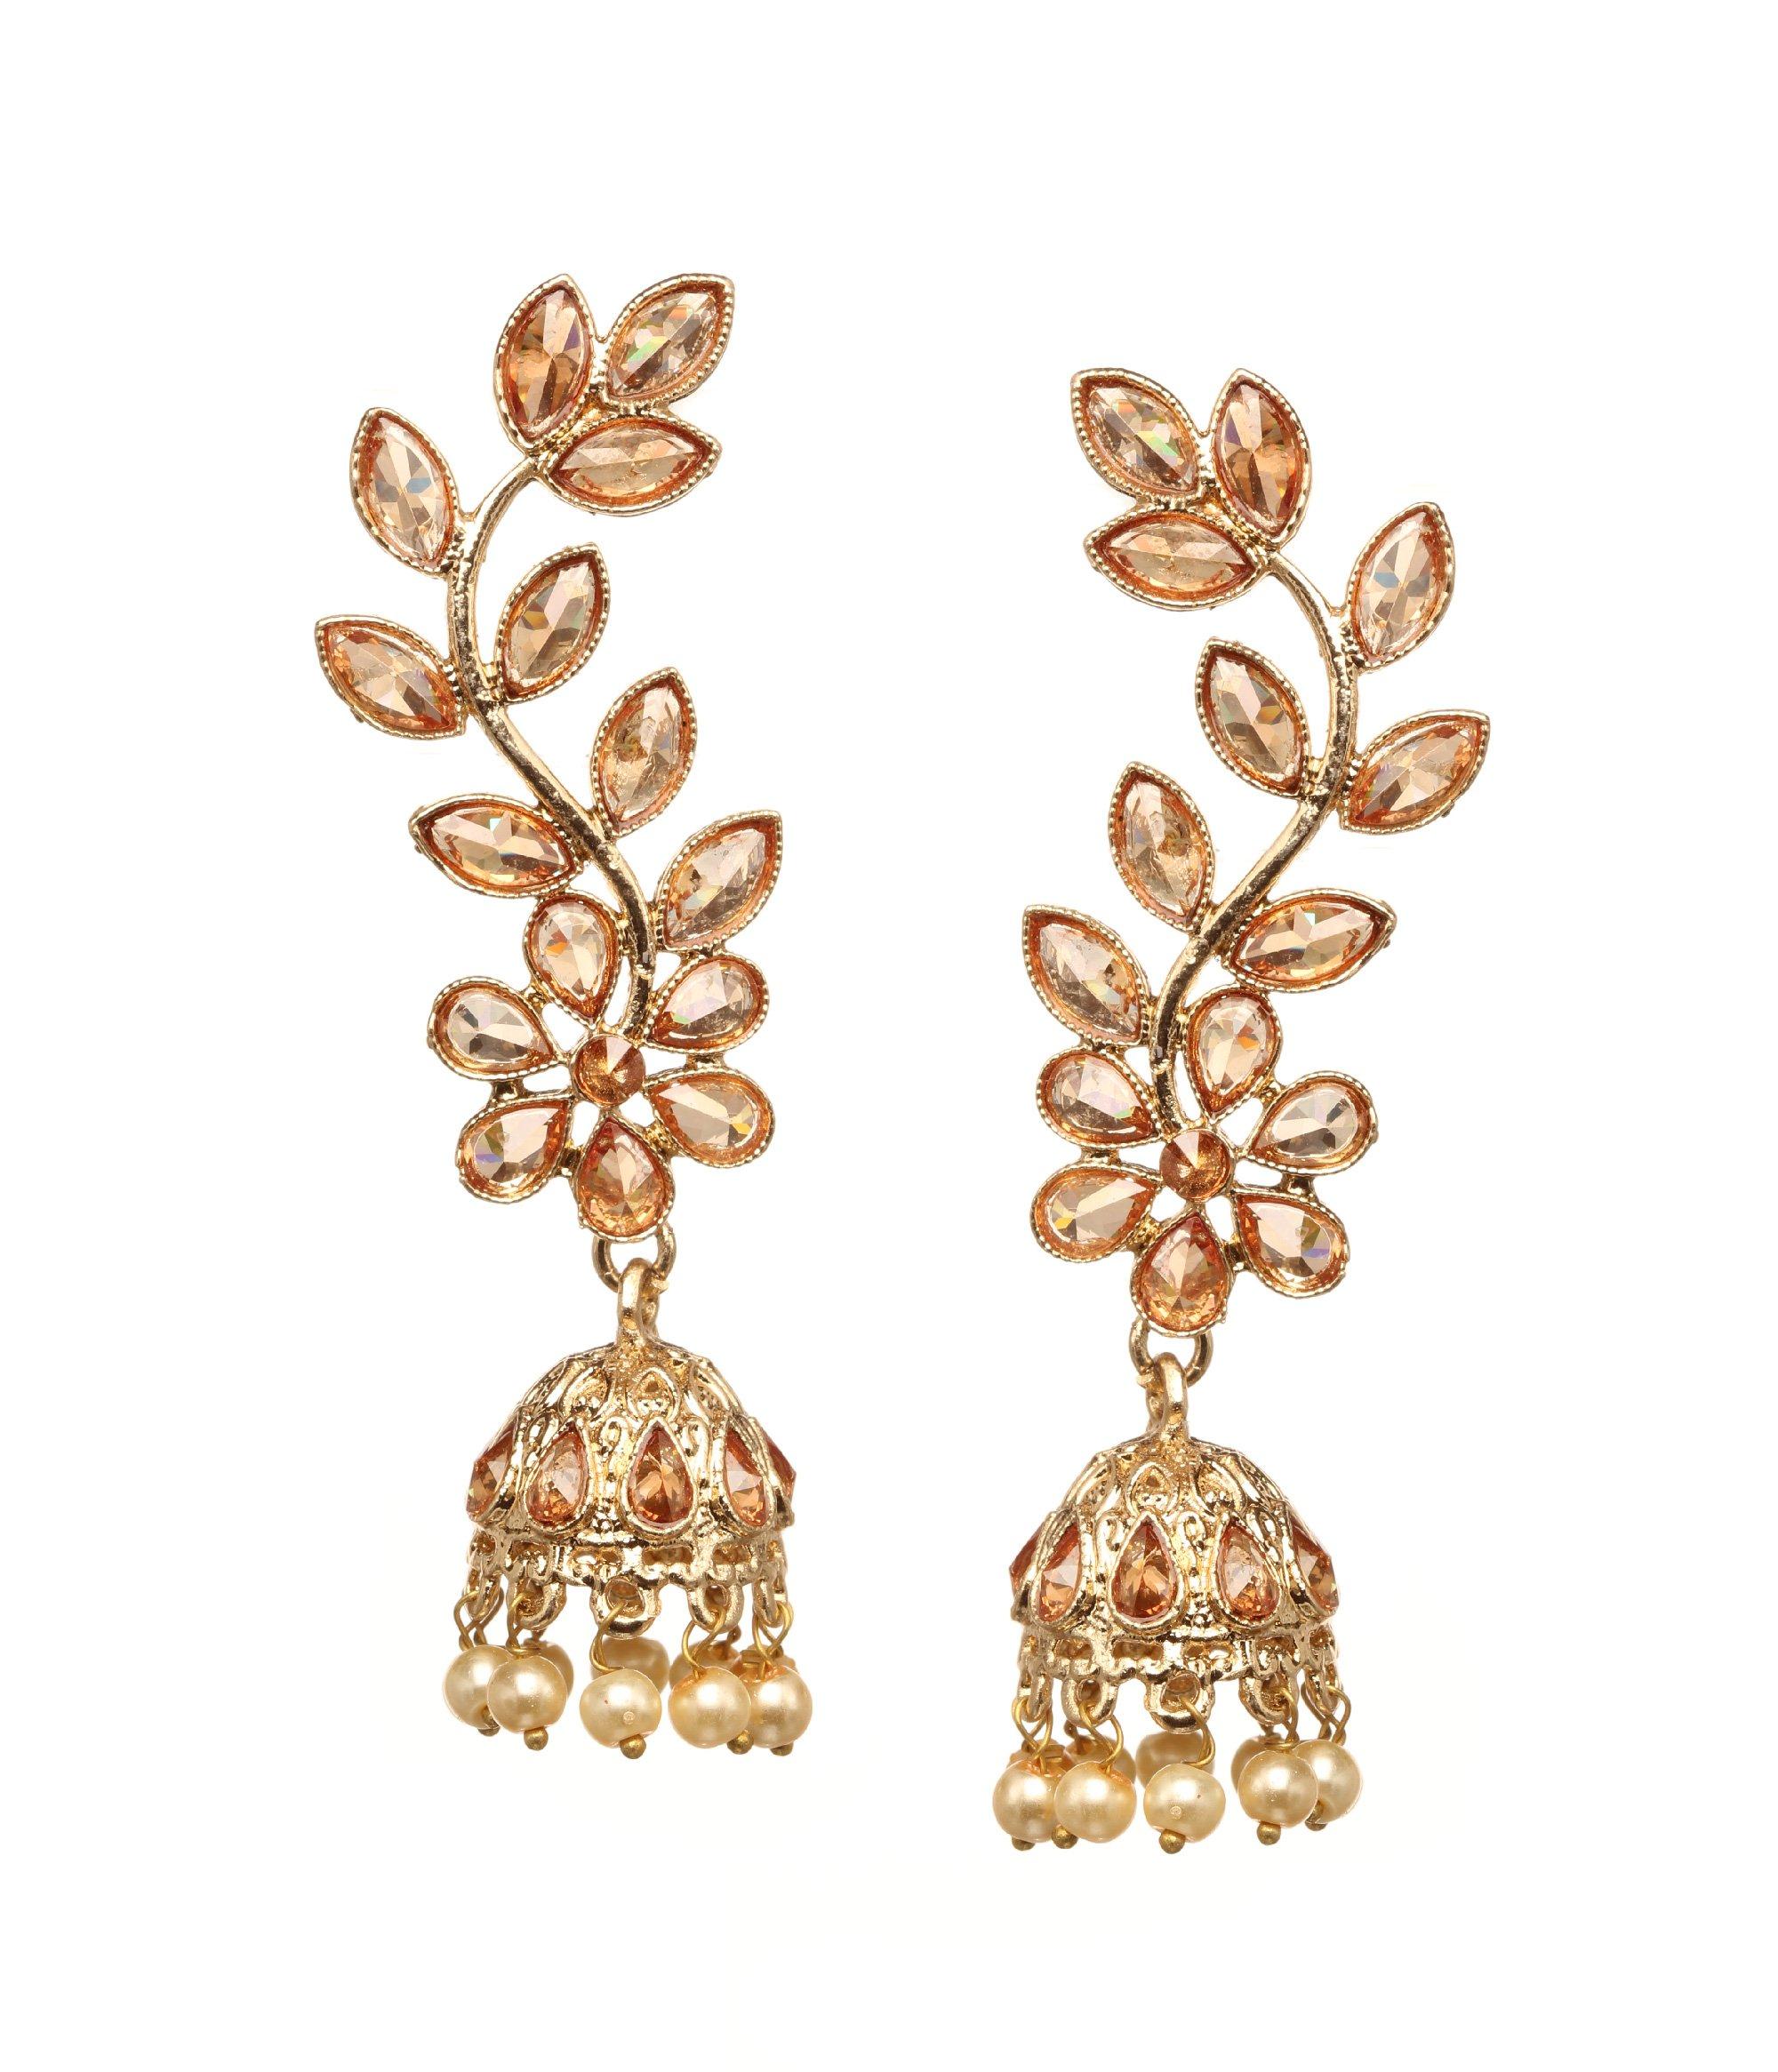 Bindhani Premium Quality Indian Wedding Bollywood Jewelry Golden Stone Dangle Jhumka Jhumki Earrings For Women